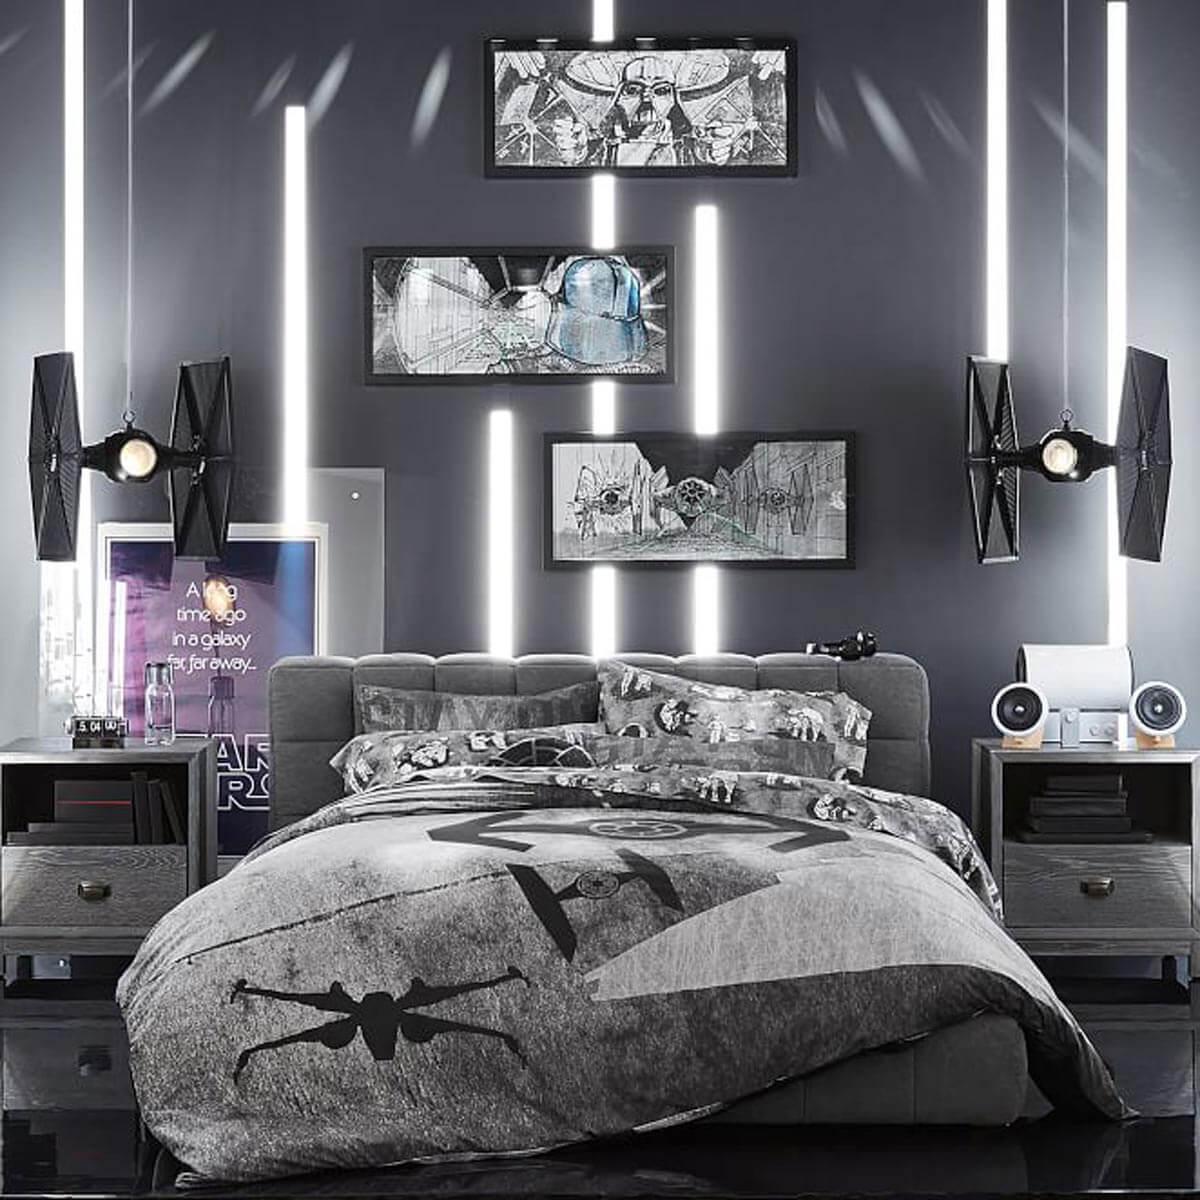 Fantastiskt Star Wars sovrum